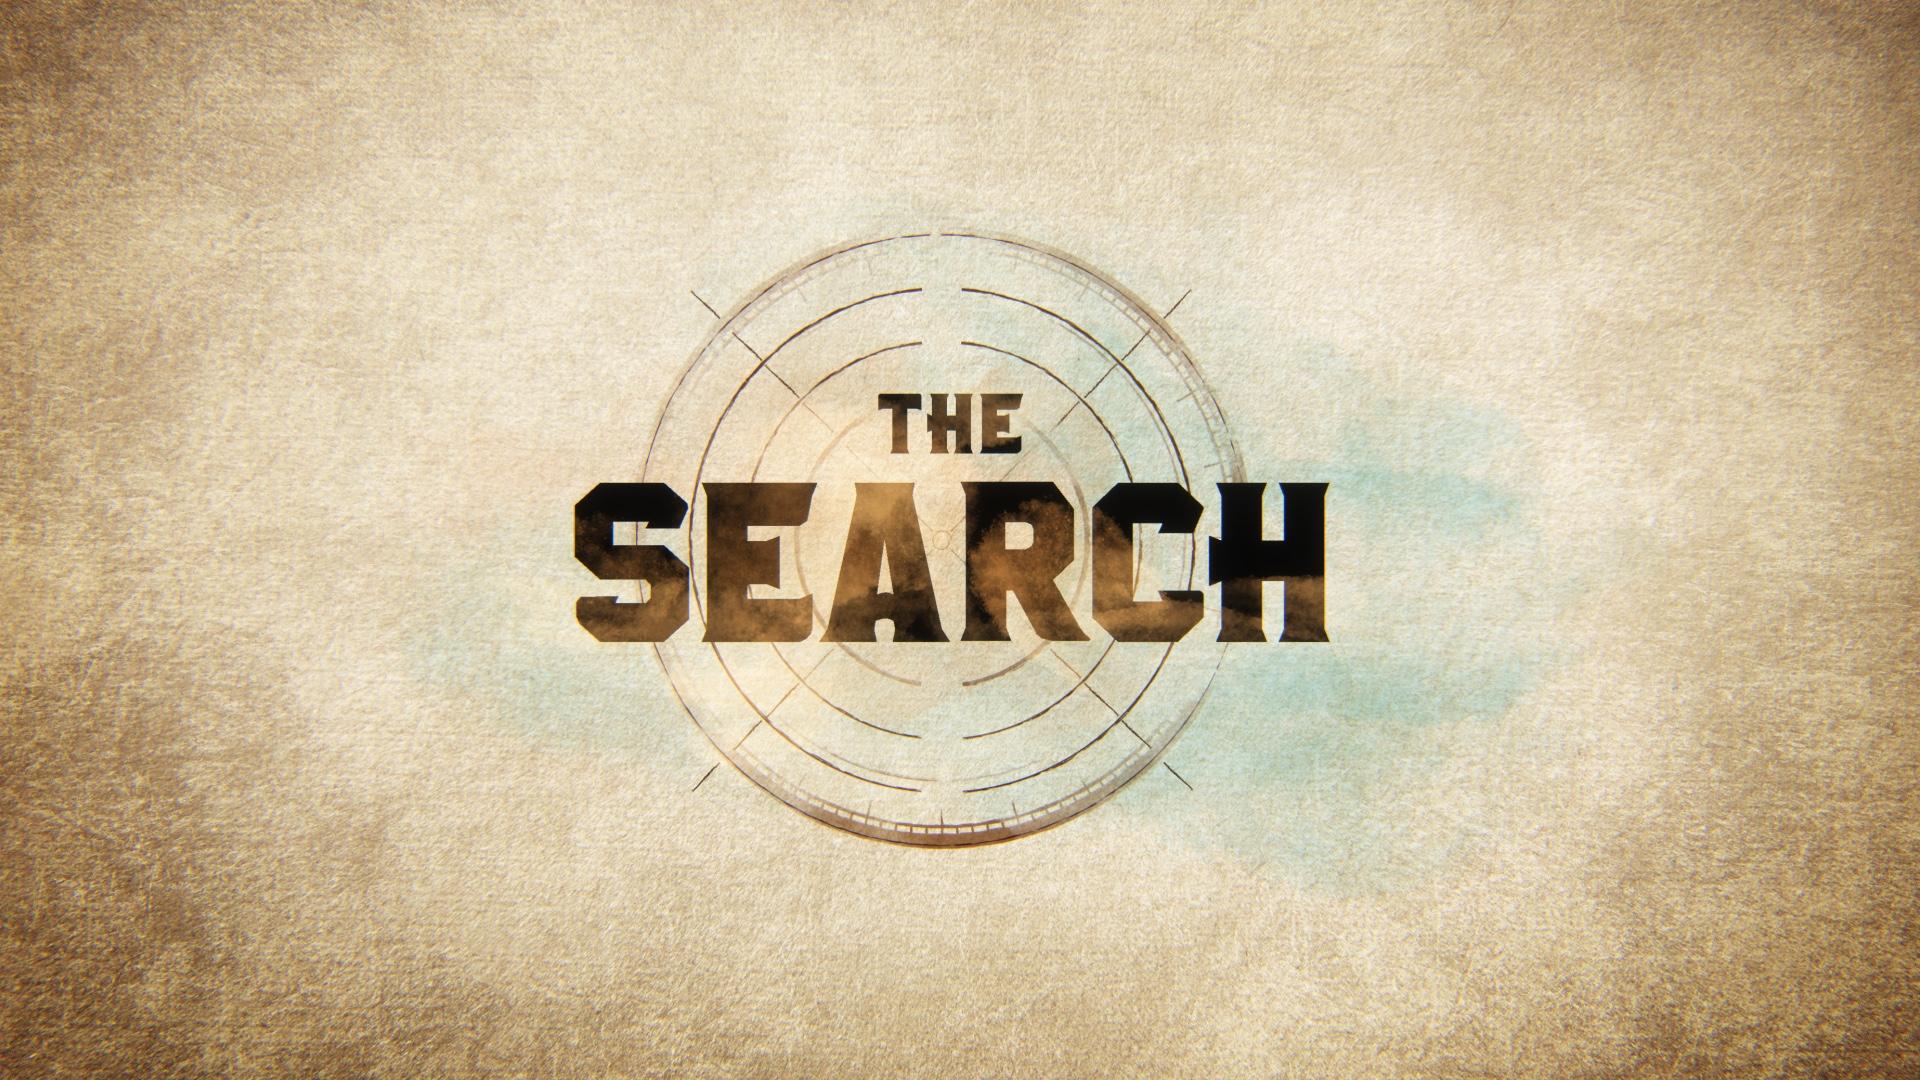 TheSearch_Drawn_v02_frame_13-1.jpg